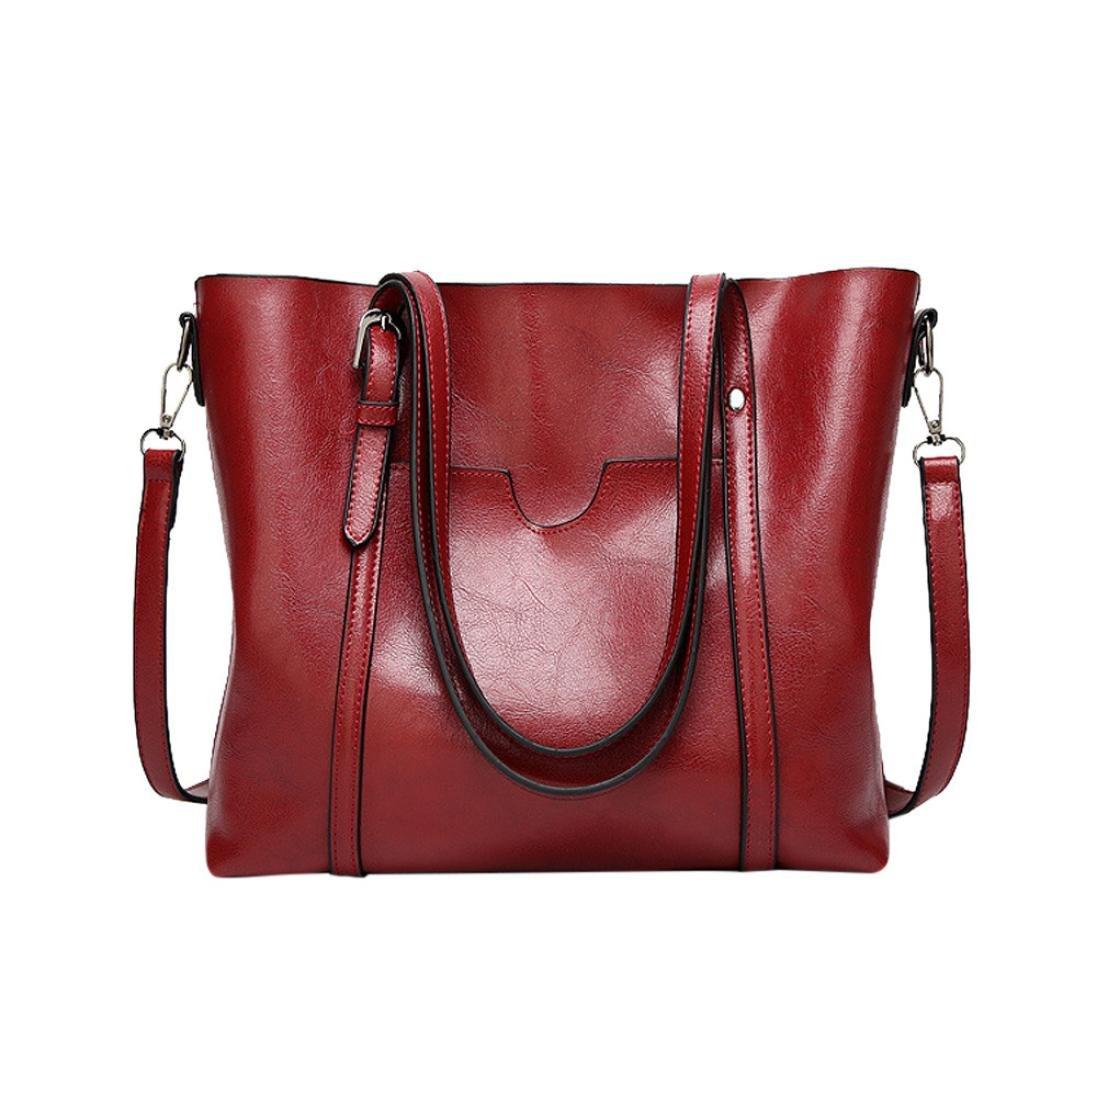 BCDshop Fashion Tote Bag Women Handbag Purses Ladies Vintage Work Travel Shoulder Bags,Large (Red)